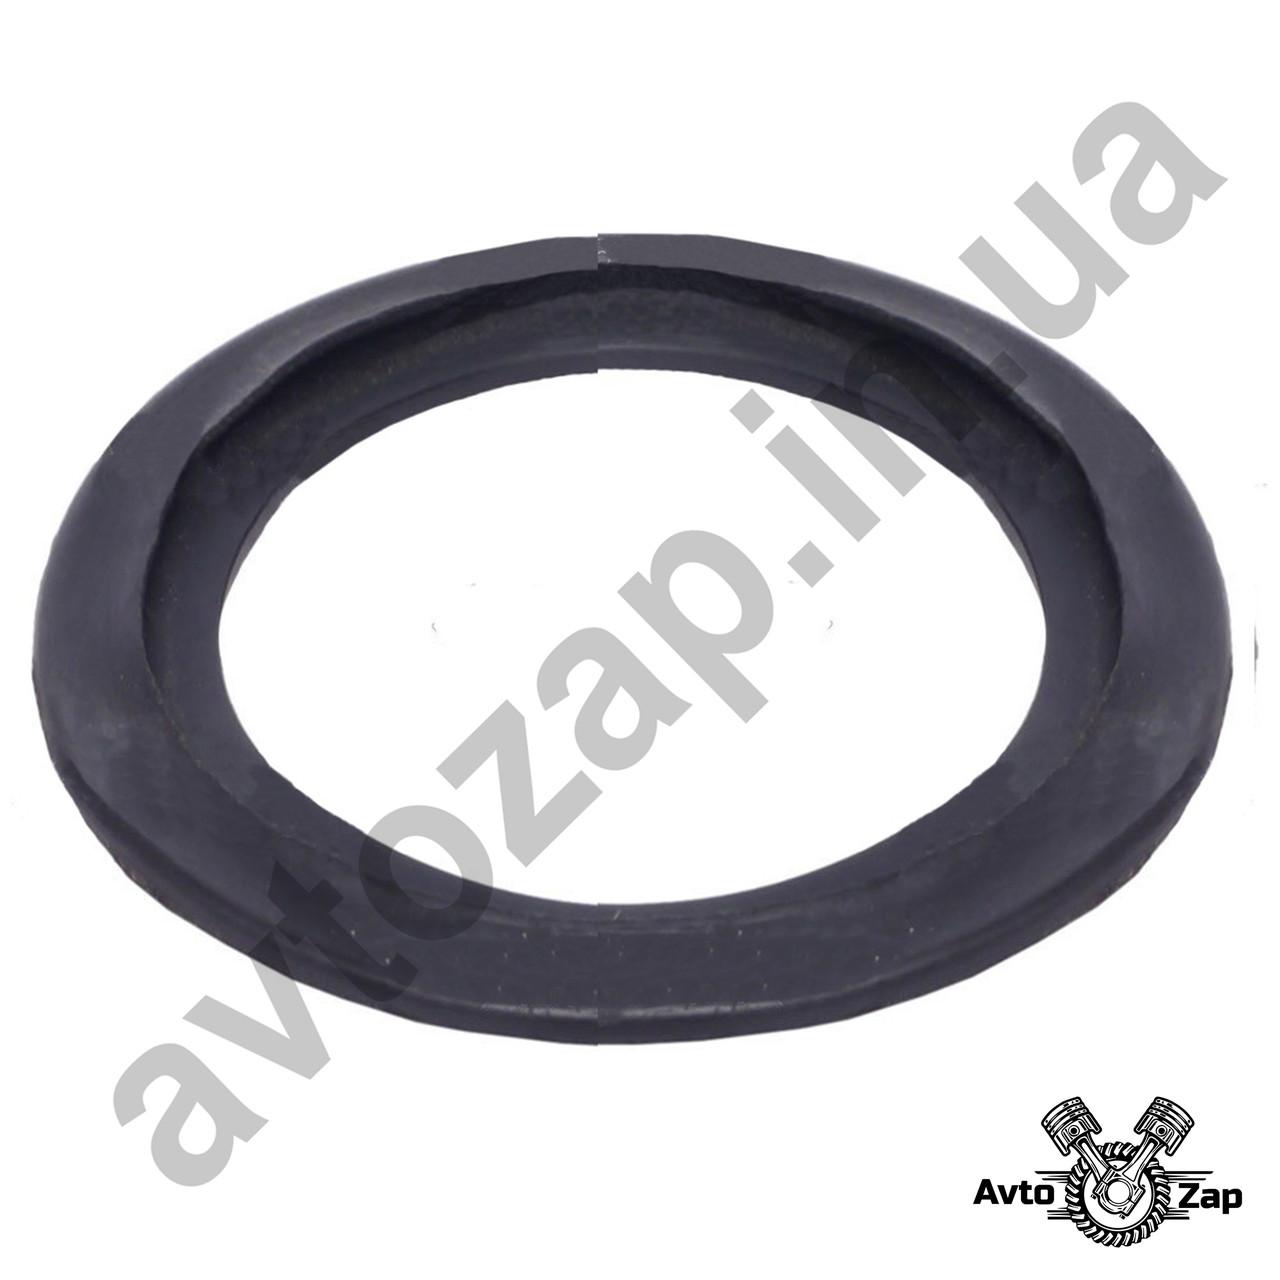 Прокладка крышки радиатора ВАЗ 2101-07  07389